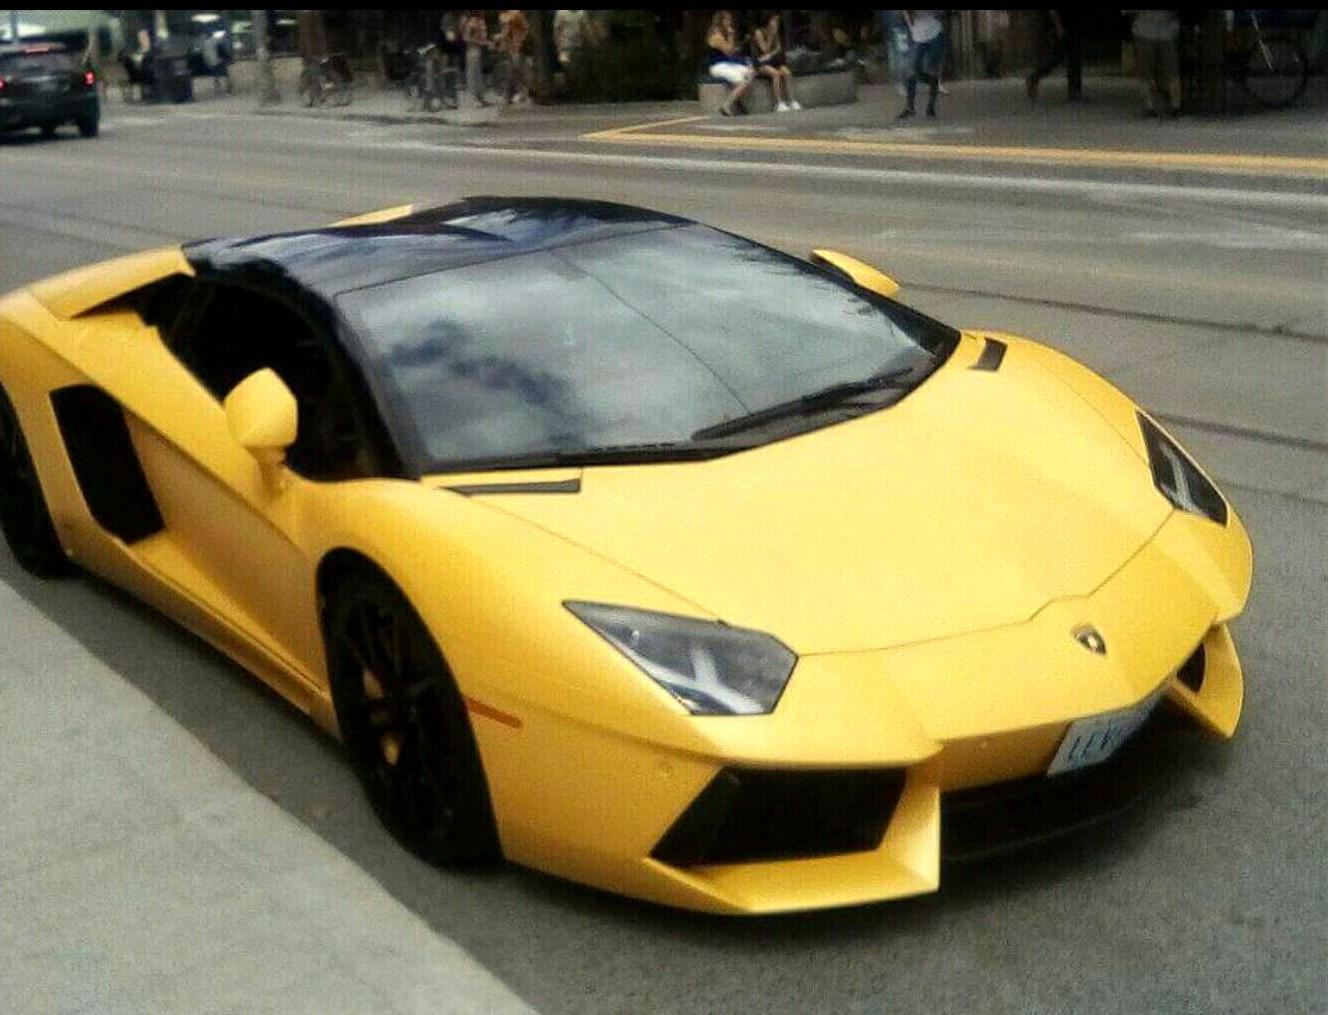 File Lamborghini Aventador 2017 2017 08 01 Jpg Wikimedia Commons